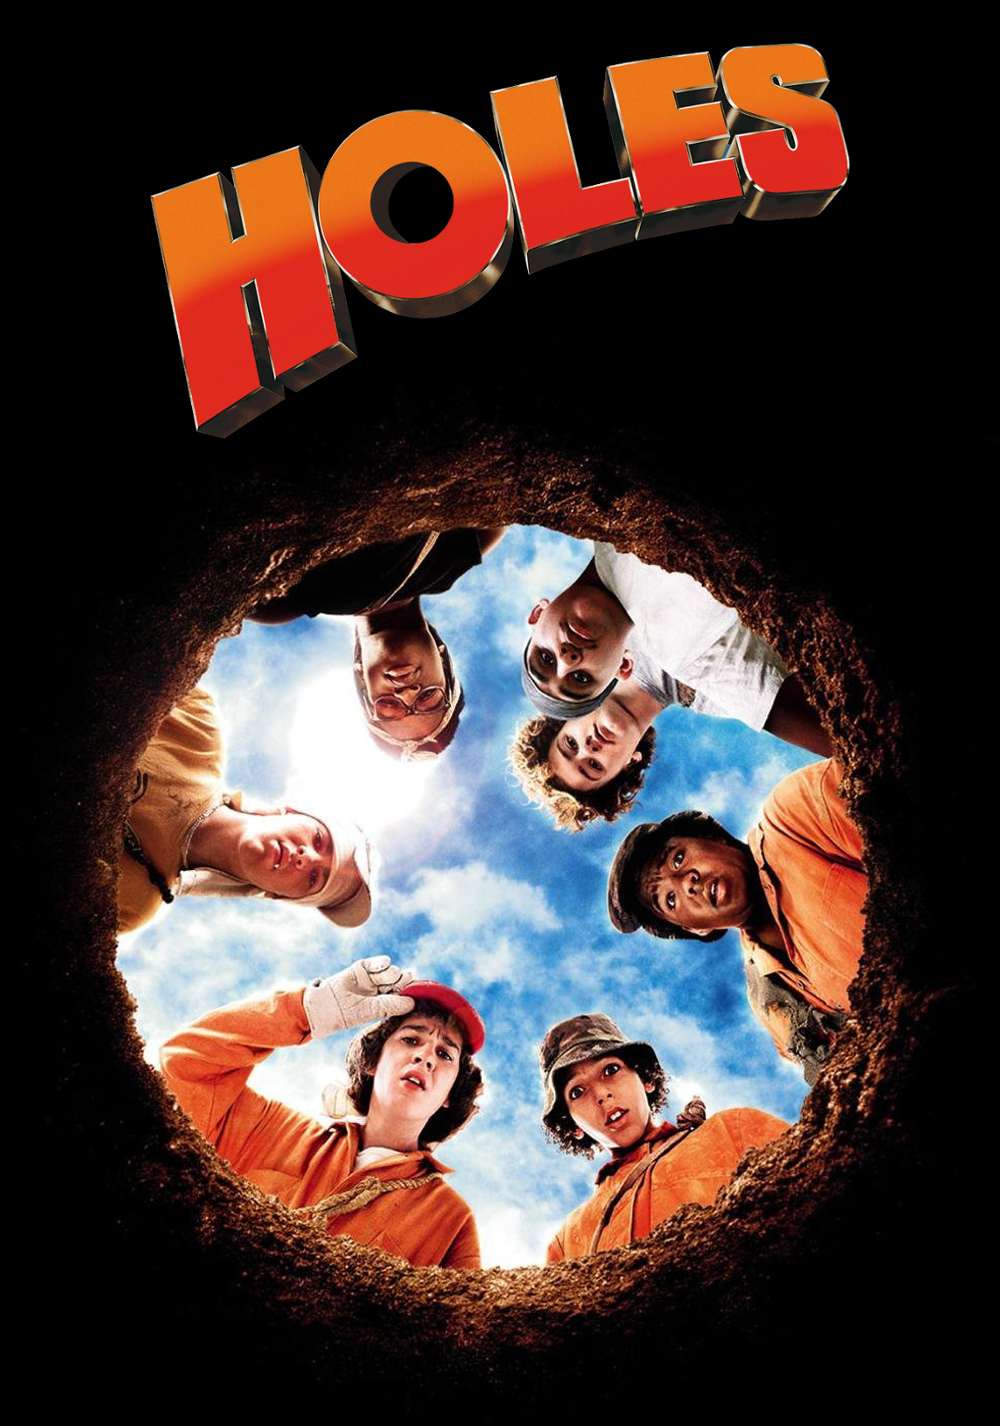 all holes movie thumbs